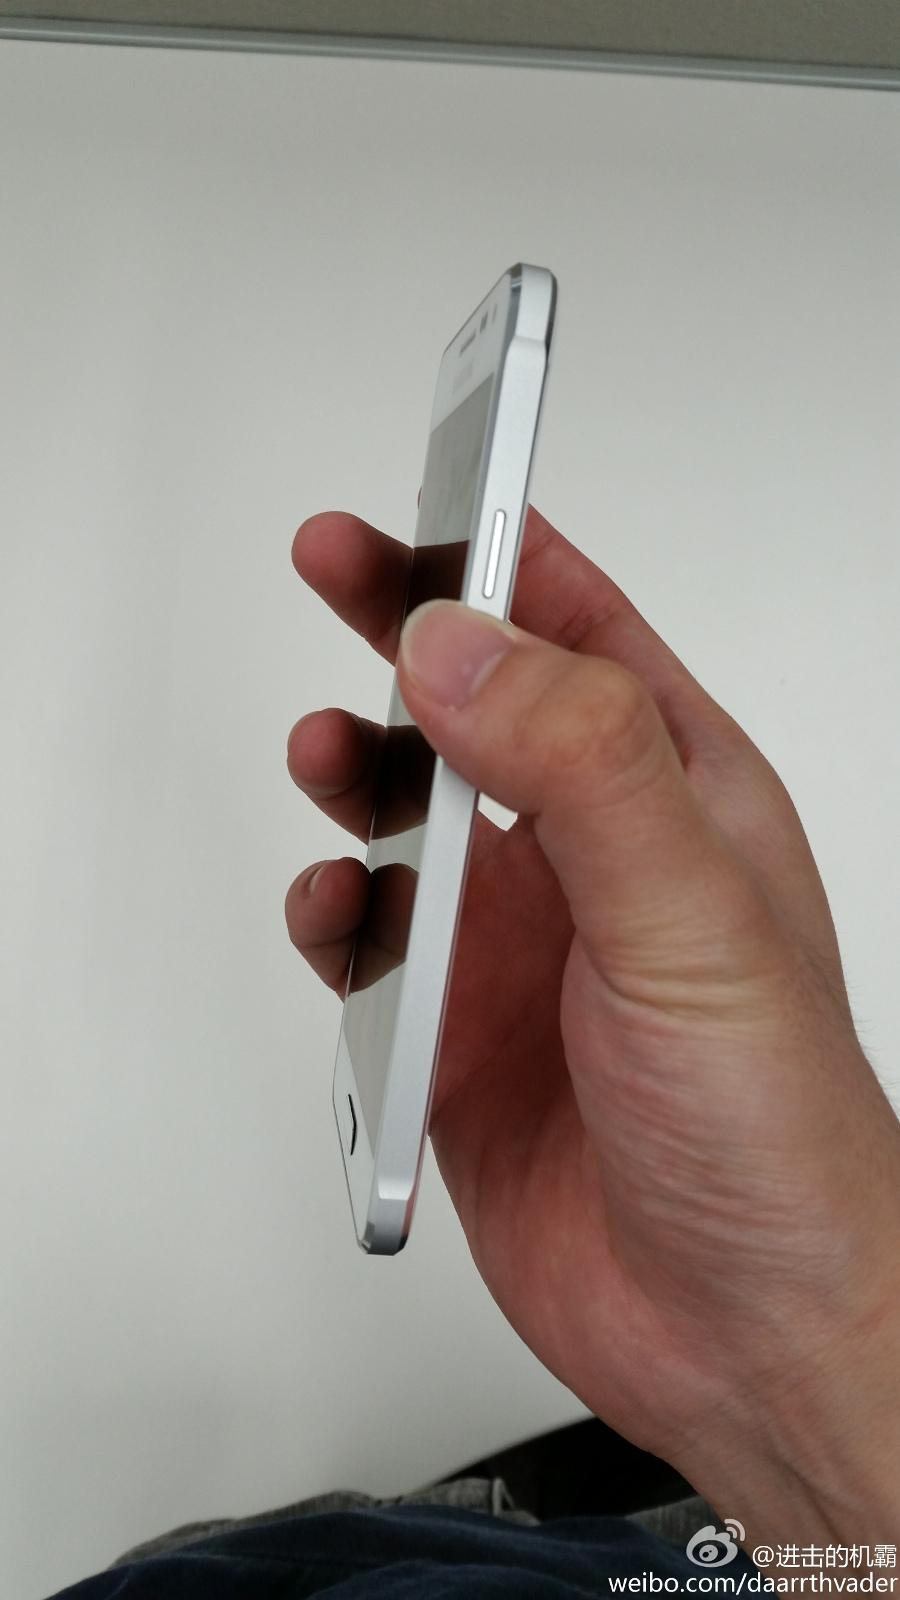 Samsung Galaxy Alpha (image 001)